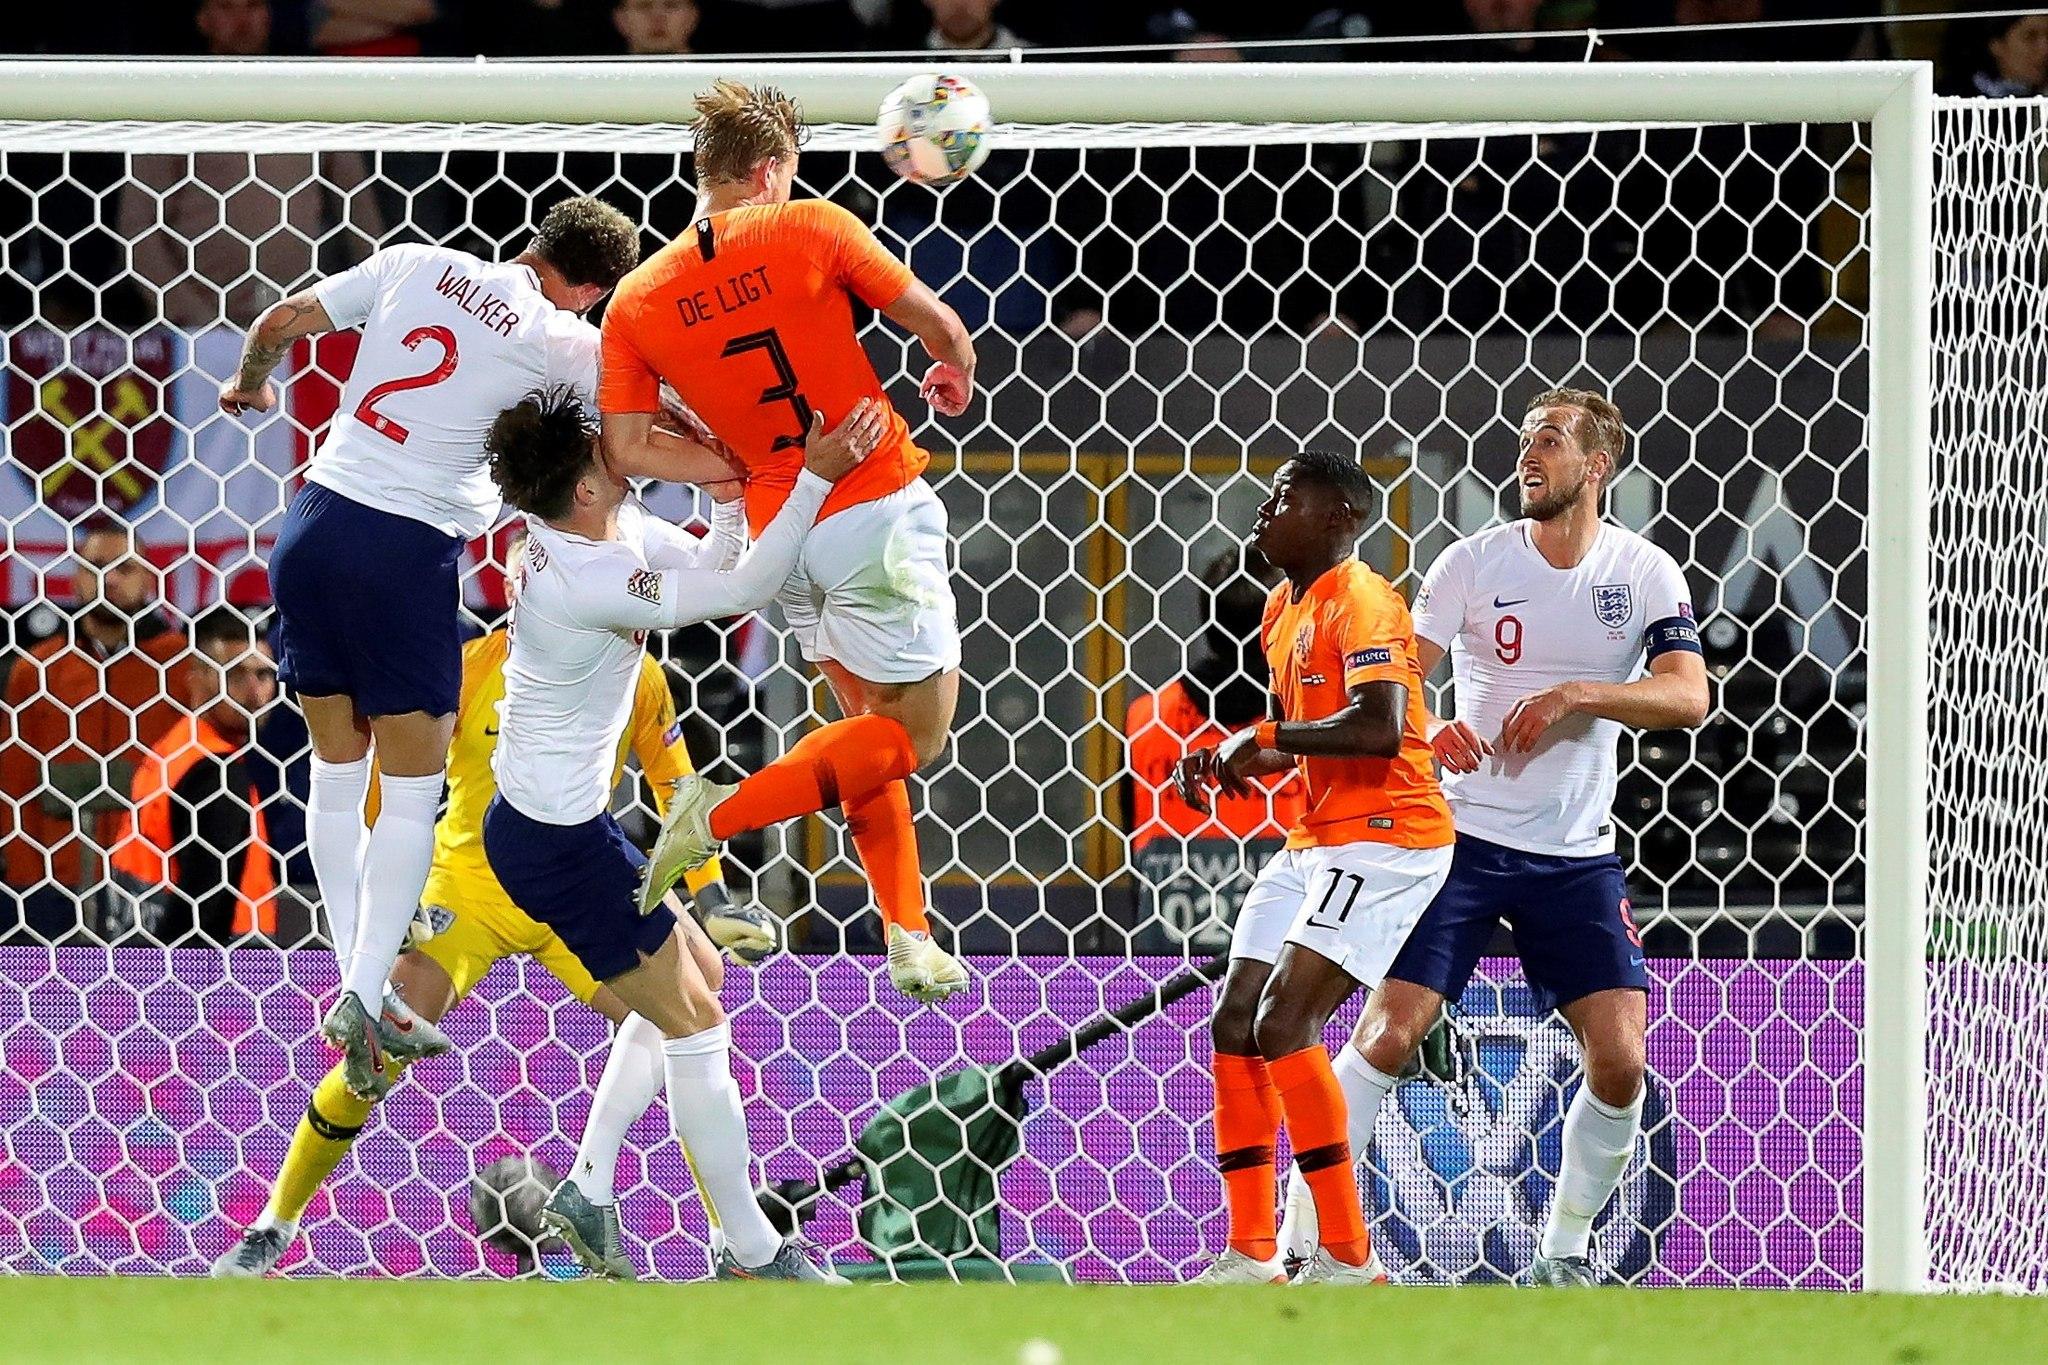 EPA4545. GUIMARAES (PORTUGAL), 06/06/2019.- Matthijs de <HIT>Ligt</HIT> (c) de Holanda anota el 1-1 durante la semifinal de la Liga de Naciones de la UEFA entre Holanda e Inglaterra este jueves, en el estadio D. Afonso Henriques, en Guimaraes (Portugal). EFE/JOSE COELHO